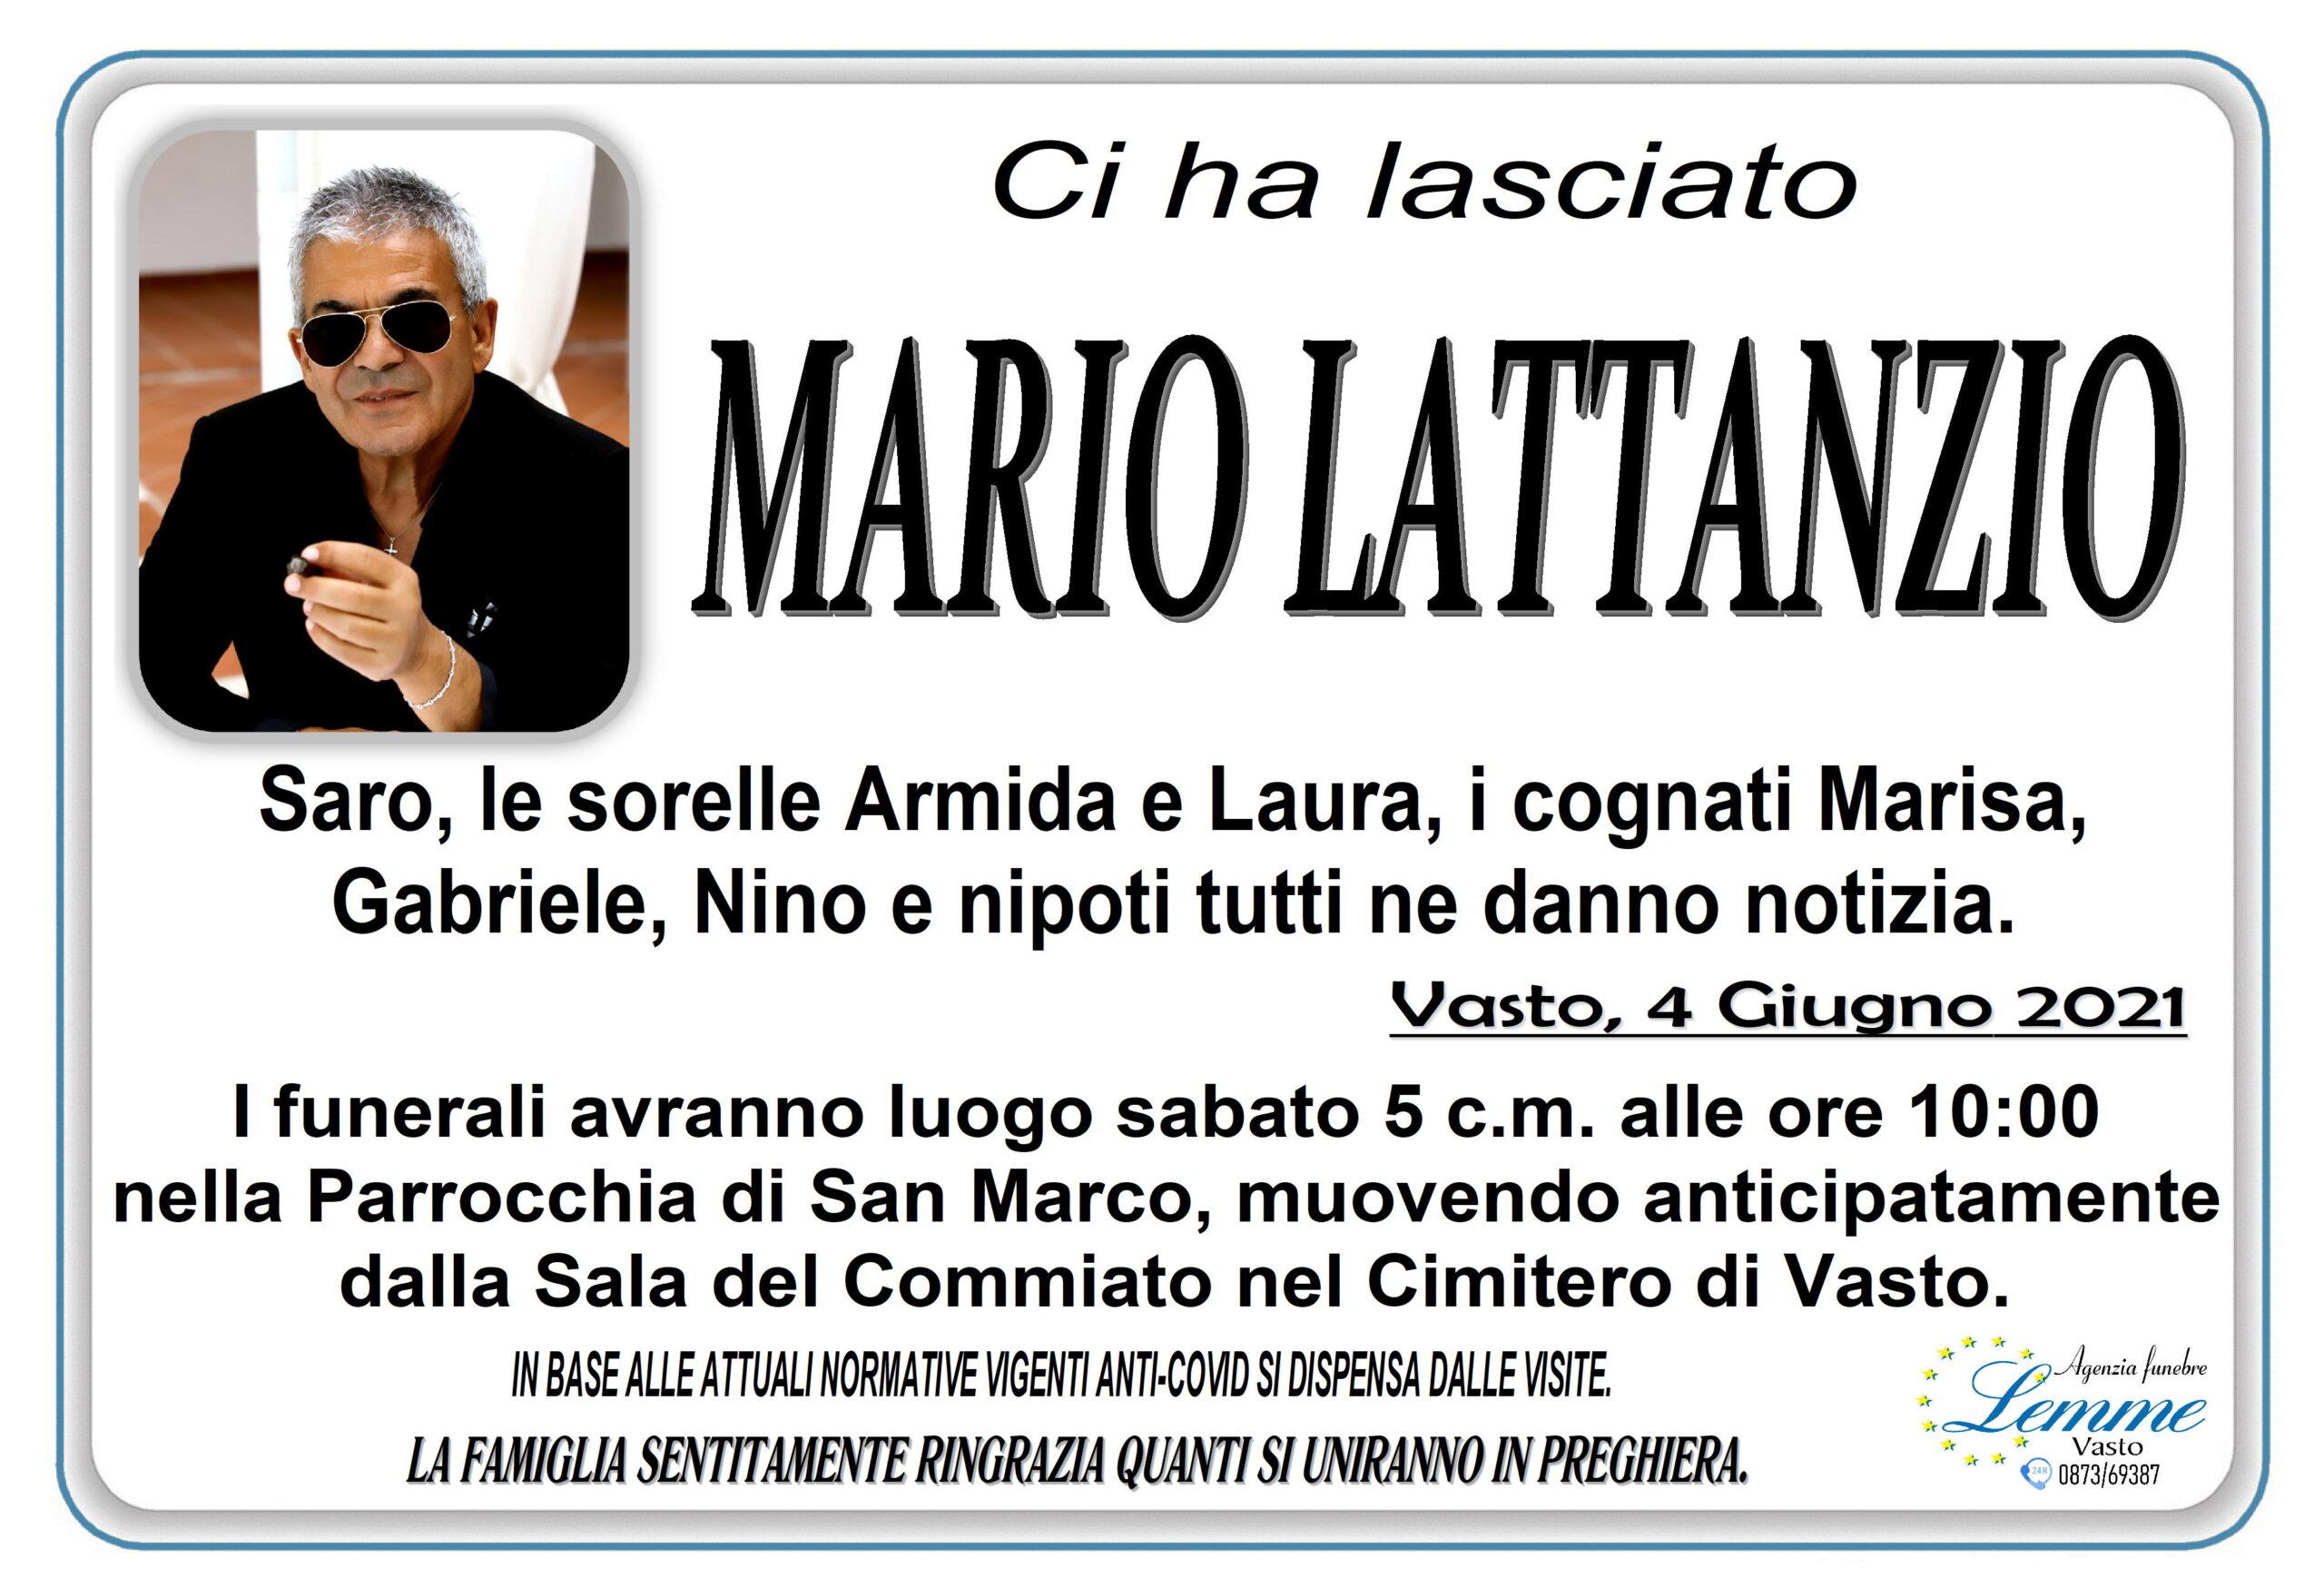 MARIO LATTANZIO